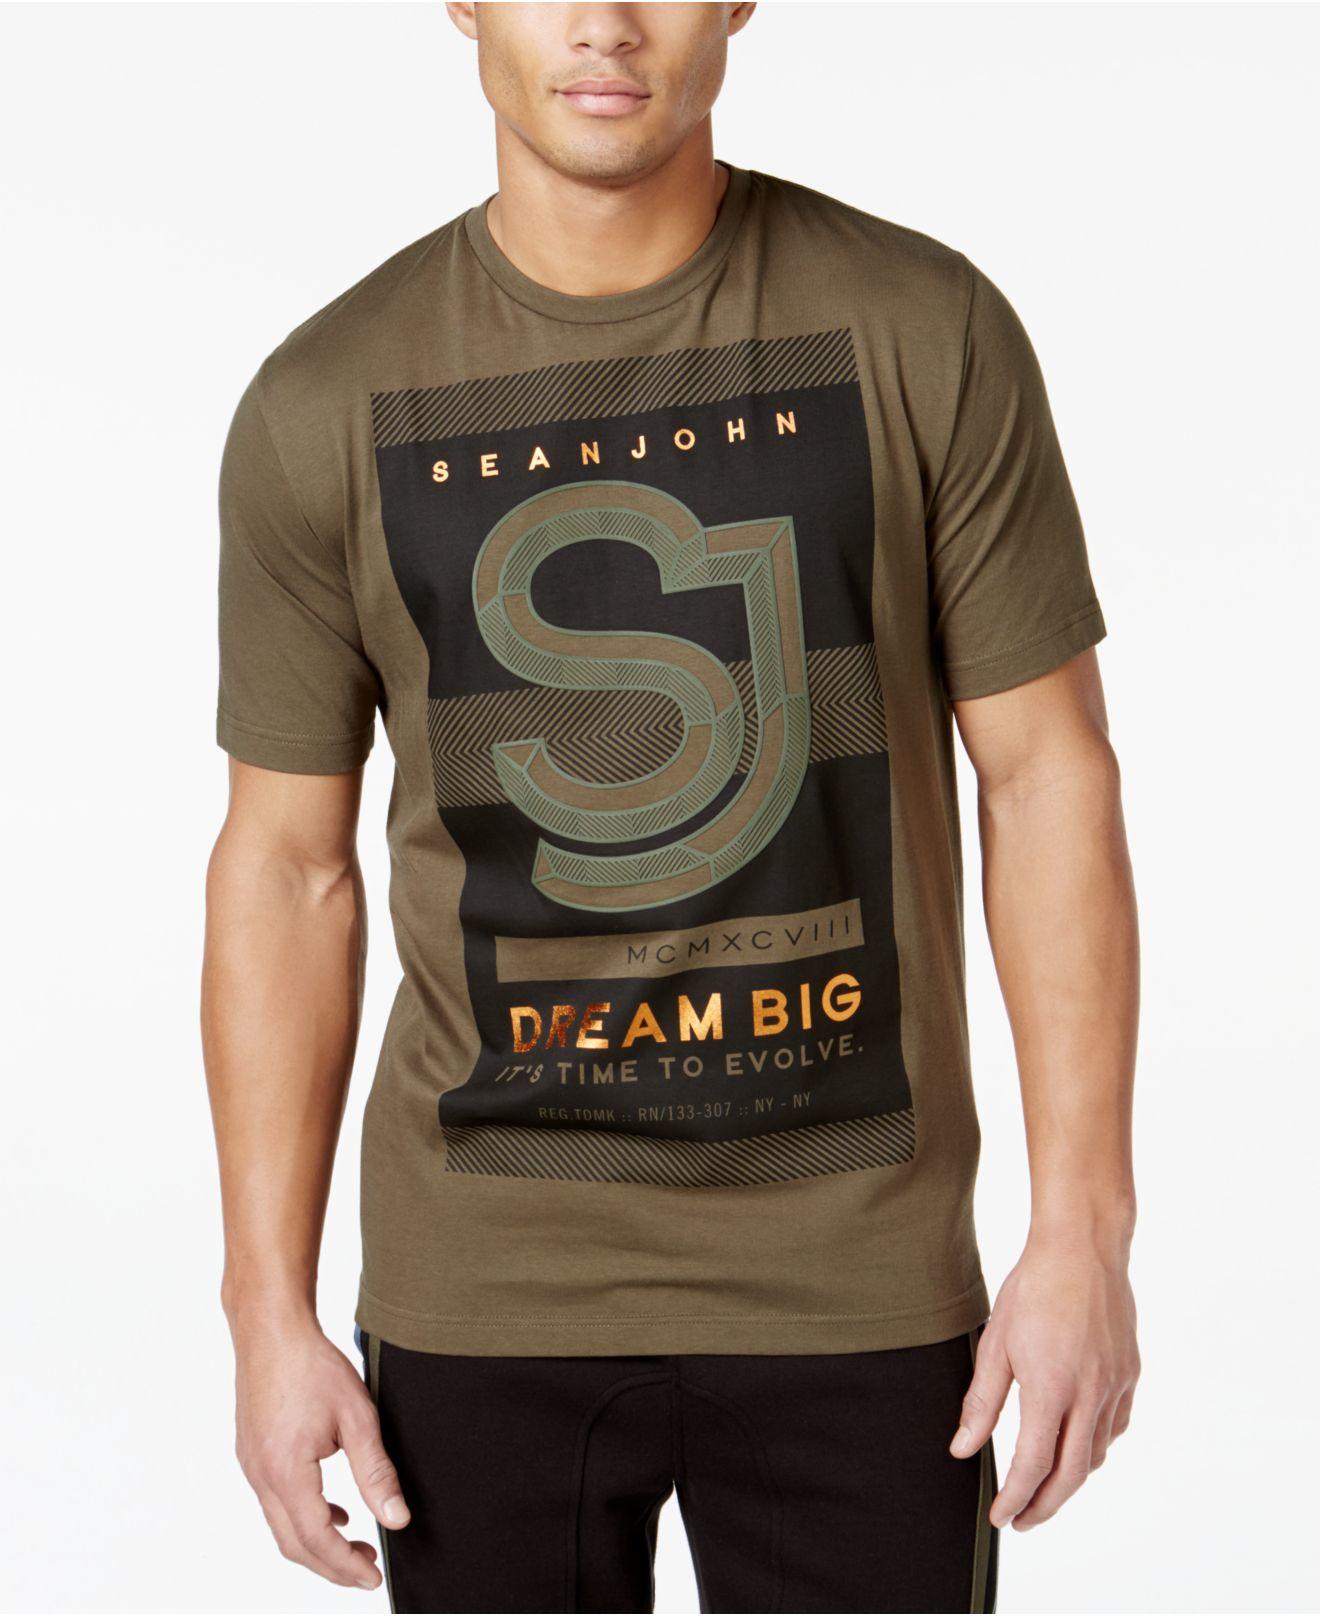 Lyst sean john men 39 s backstage t shirt in green for men for Sean john t shirts for mens